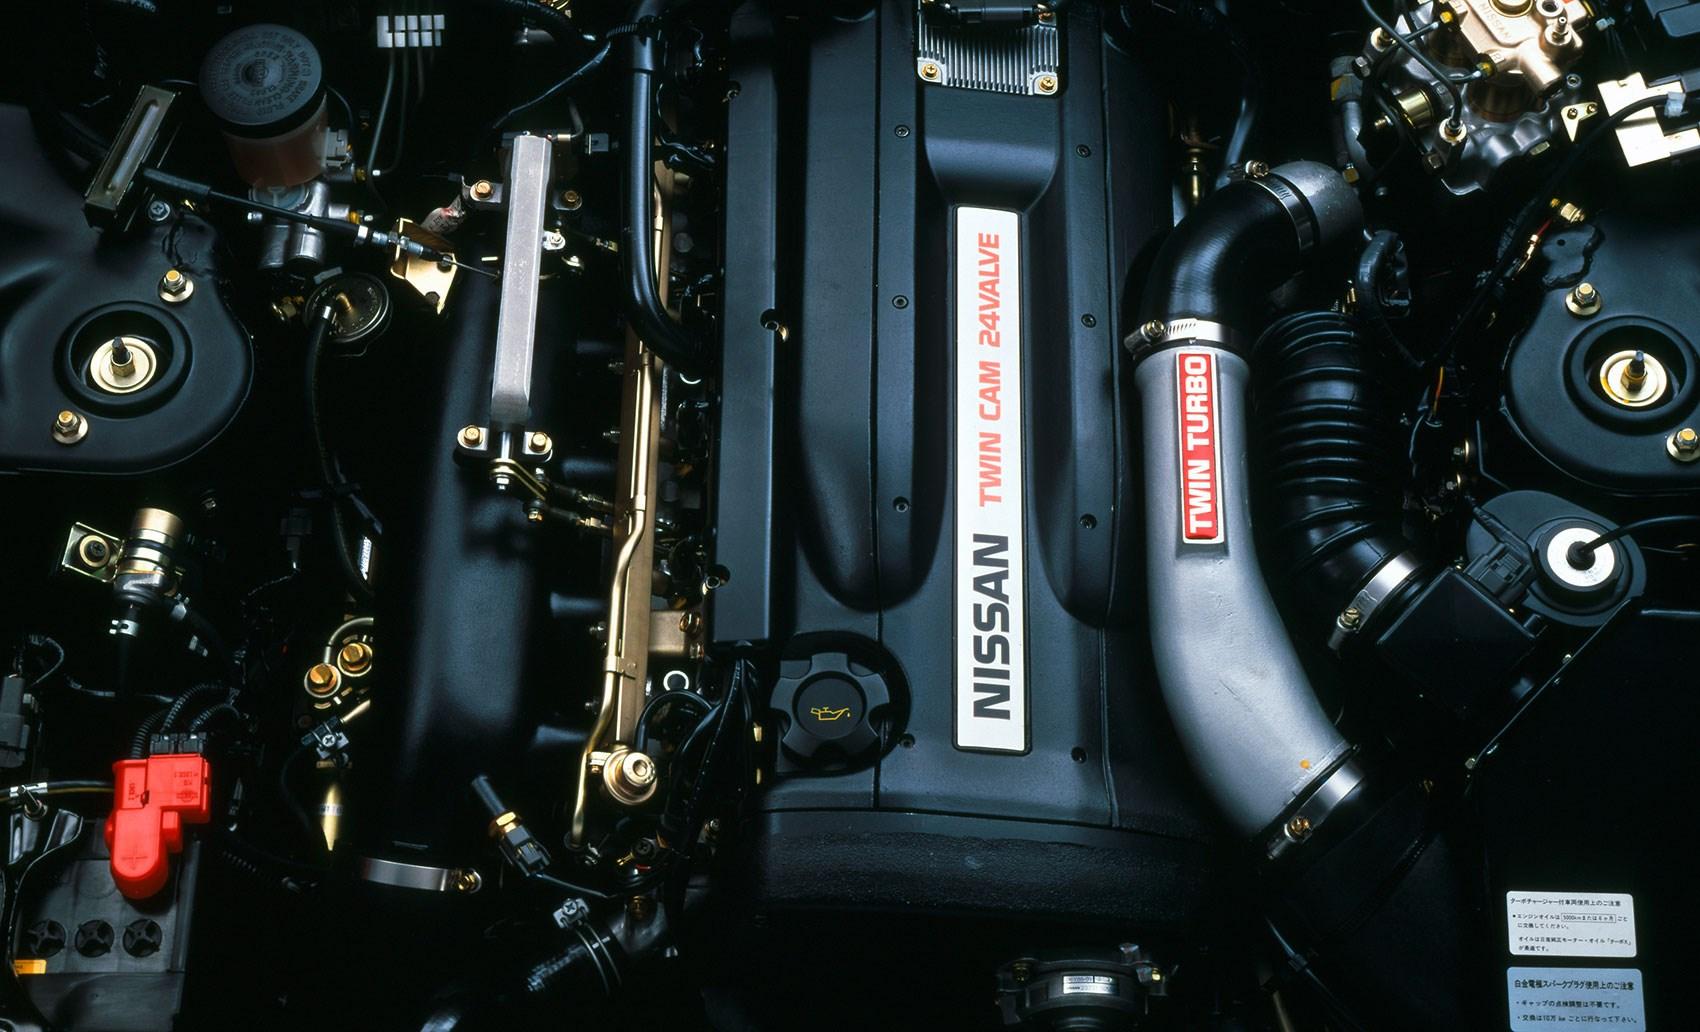 The world's most advanced road car: Nissan Skyline R32 GT-R